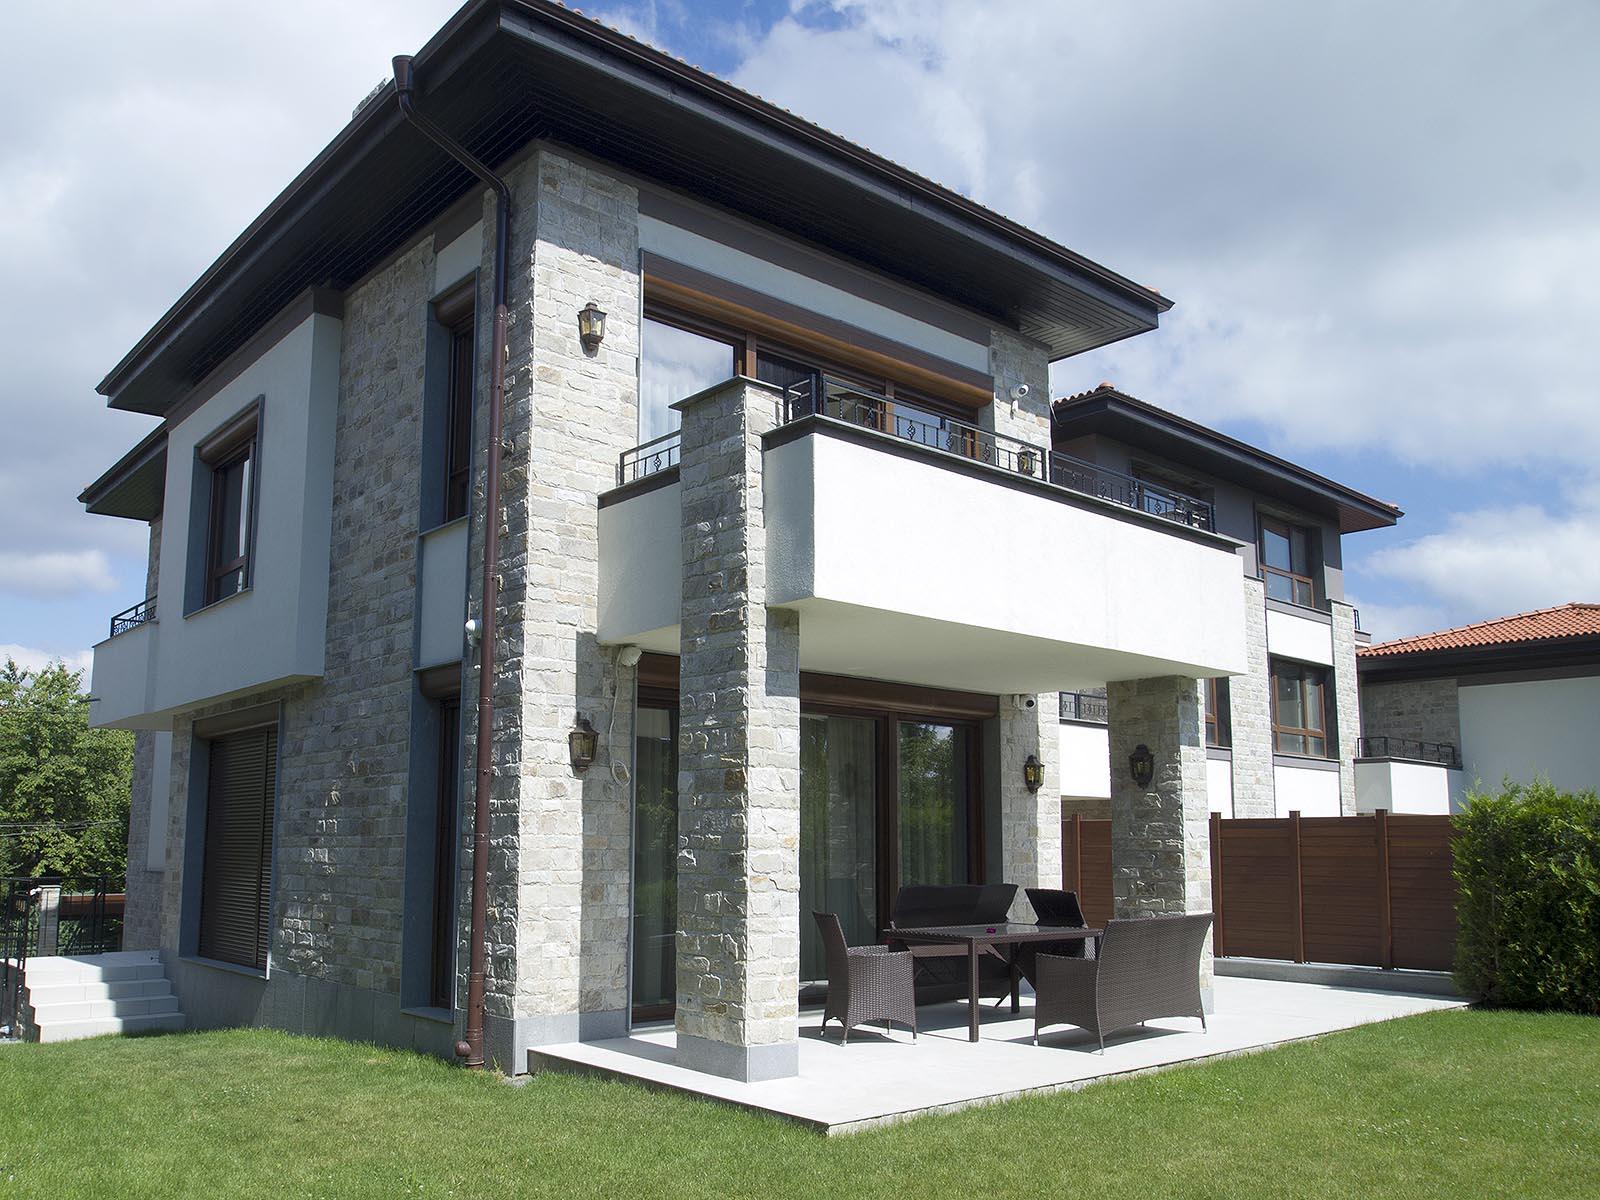 Single Family House Sofia Simeonovo